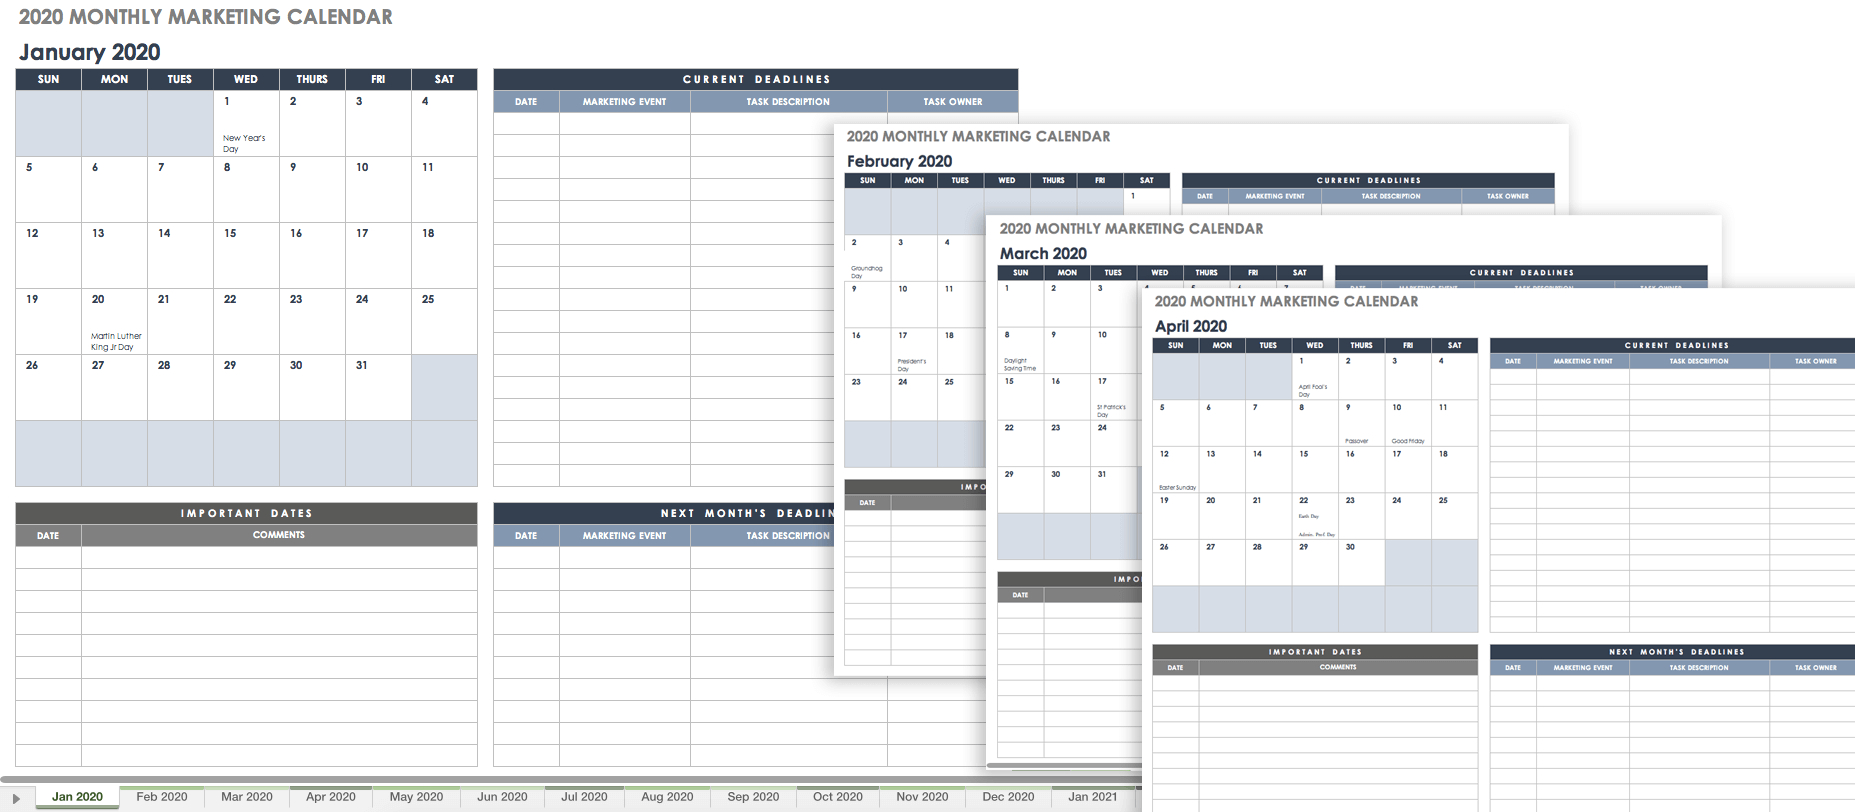 9 Free Marketing Calendar Templates For Excel - Smartsheet